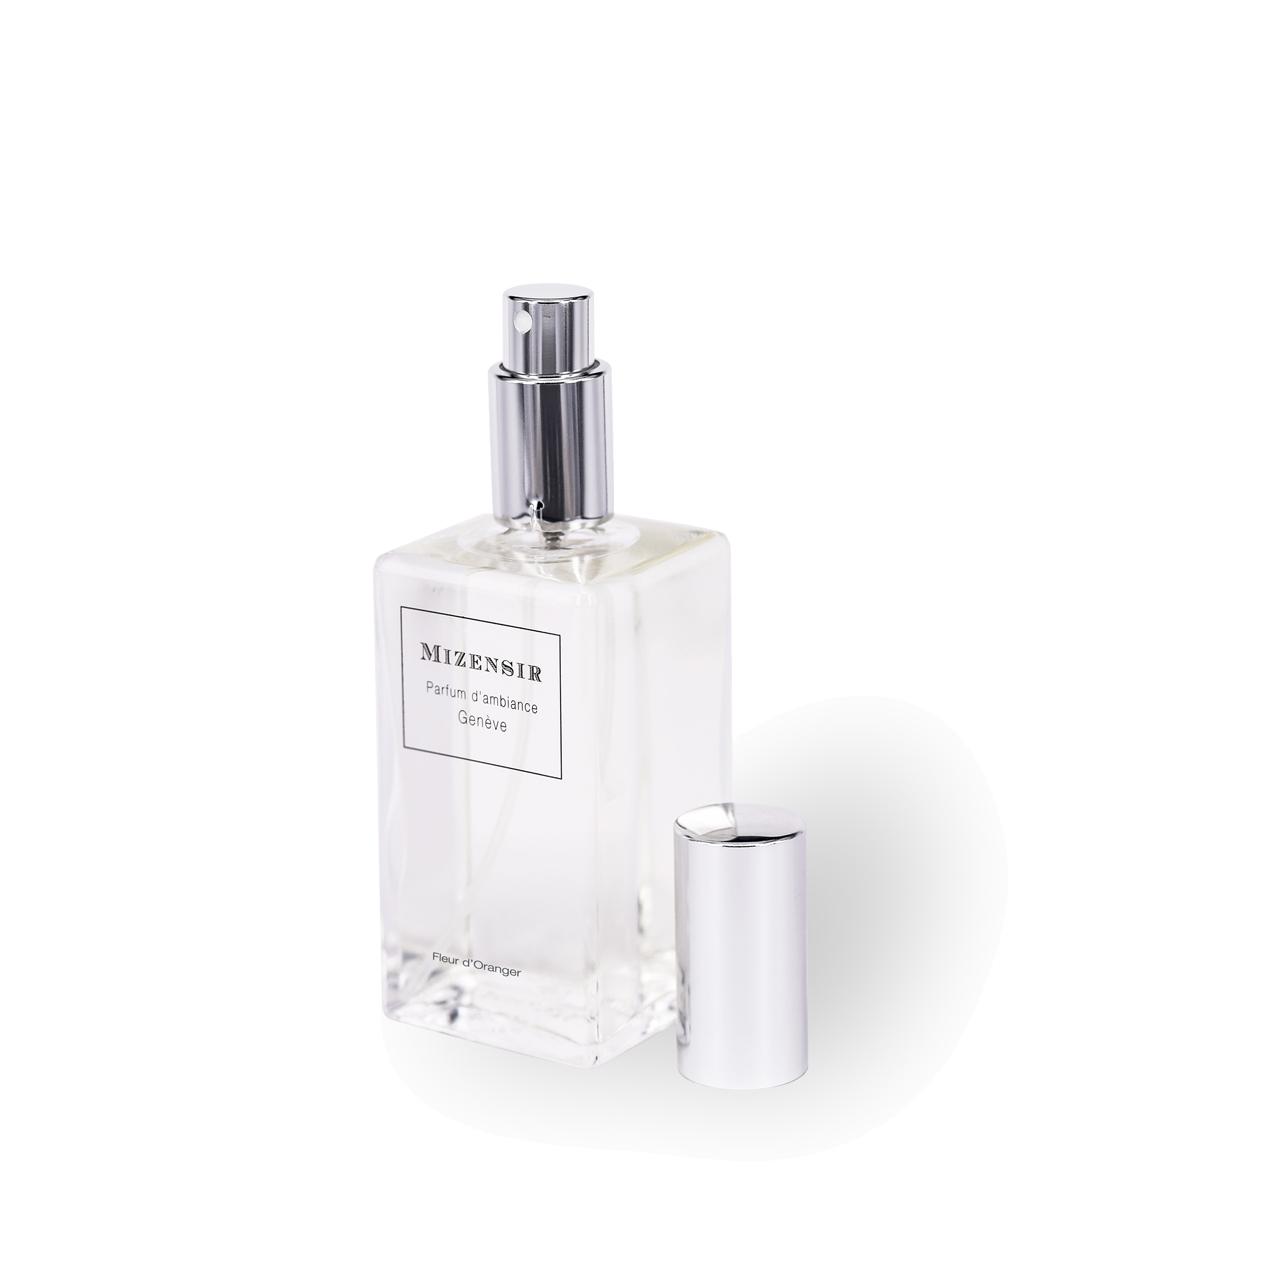 Fleur d'Oranger - Room Fragrance